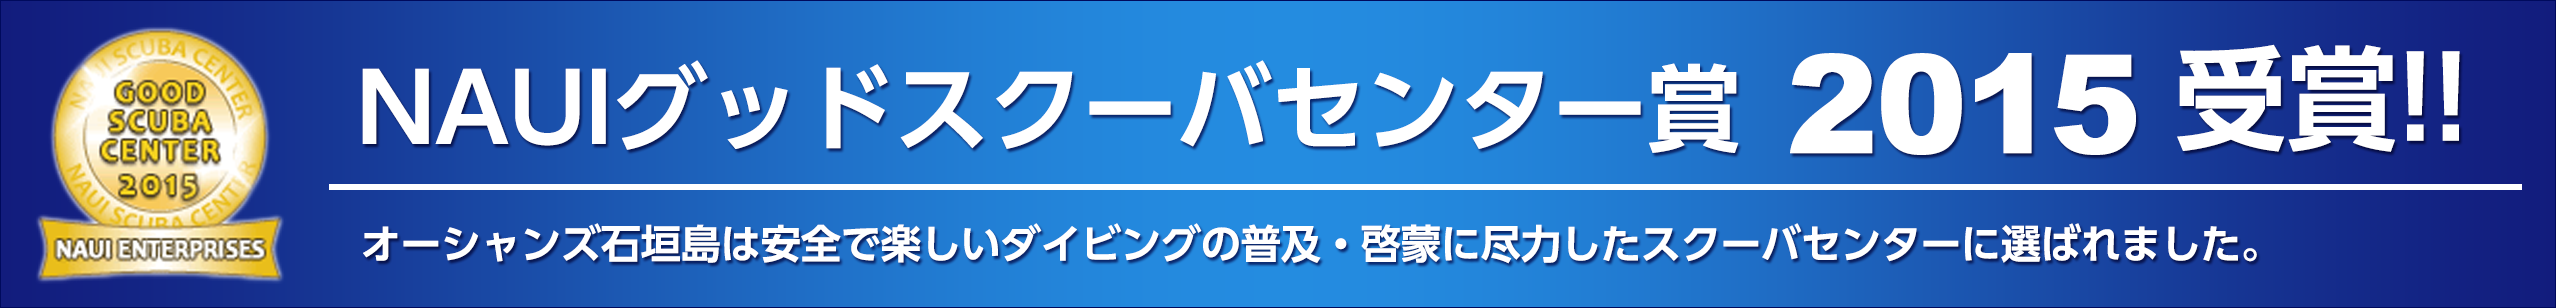 NAUIグッドスクーバセンター賞 2015受賞!!